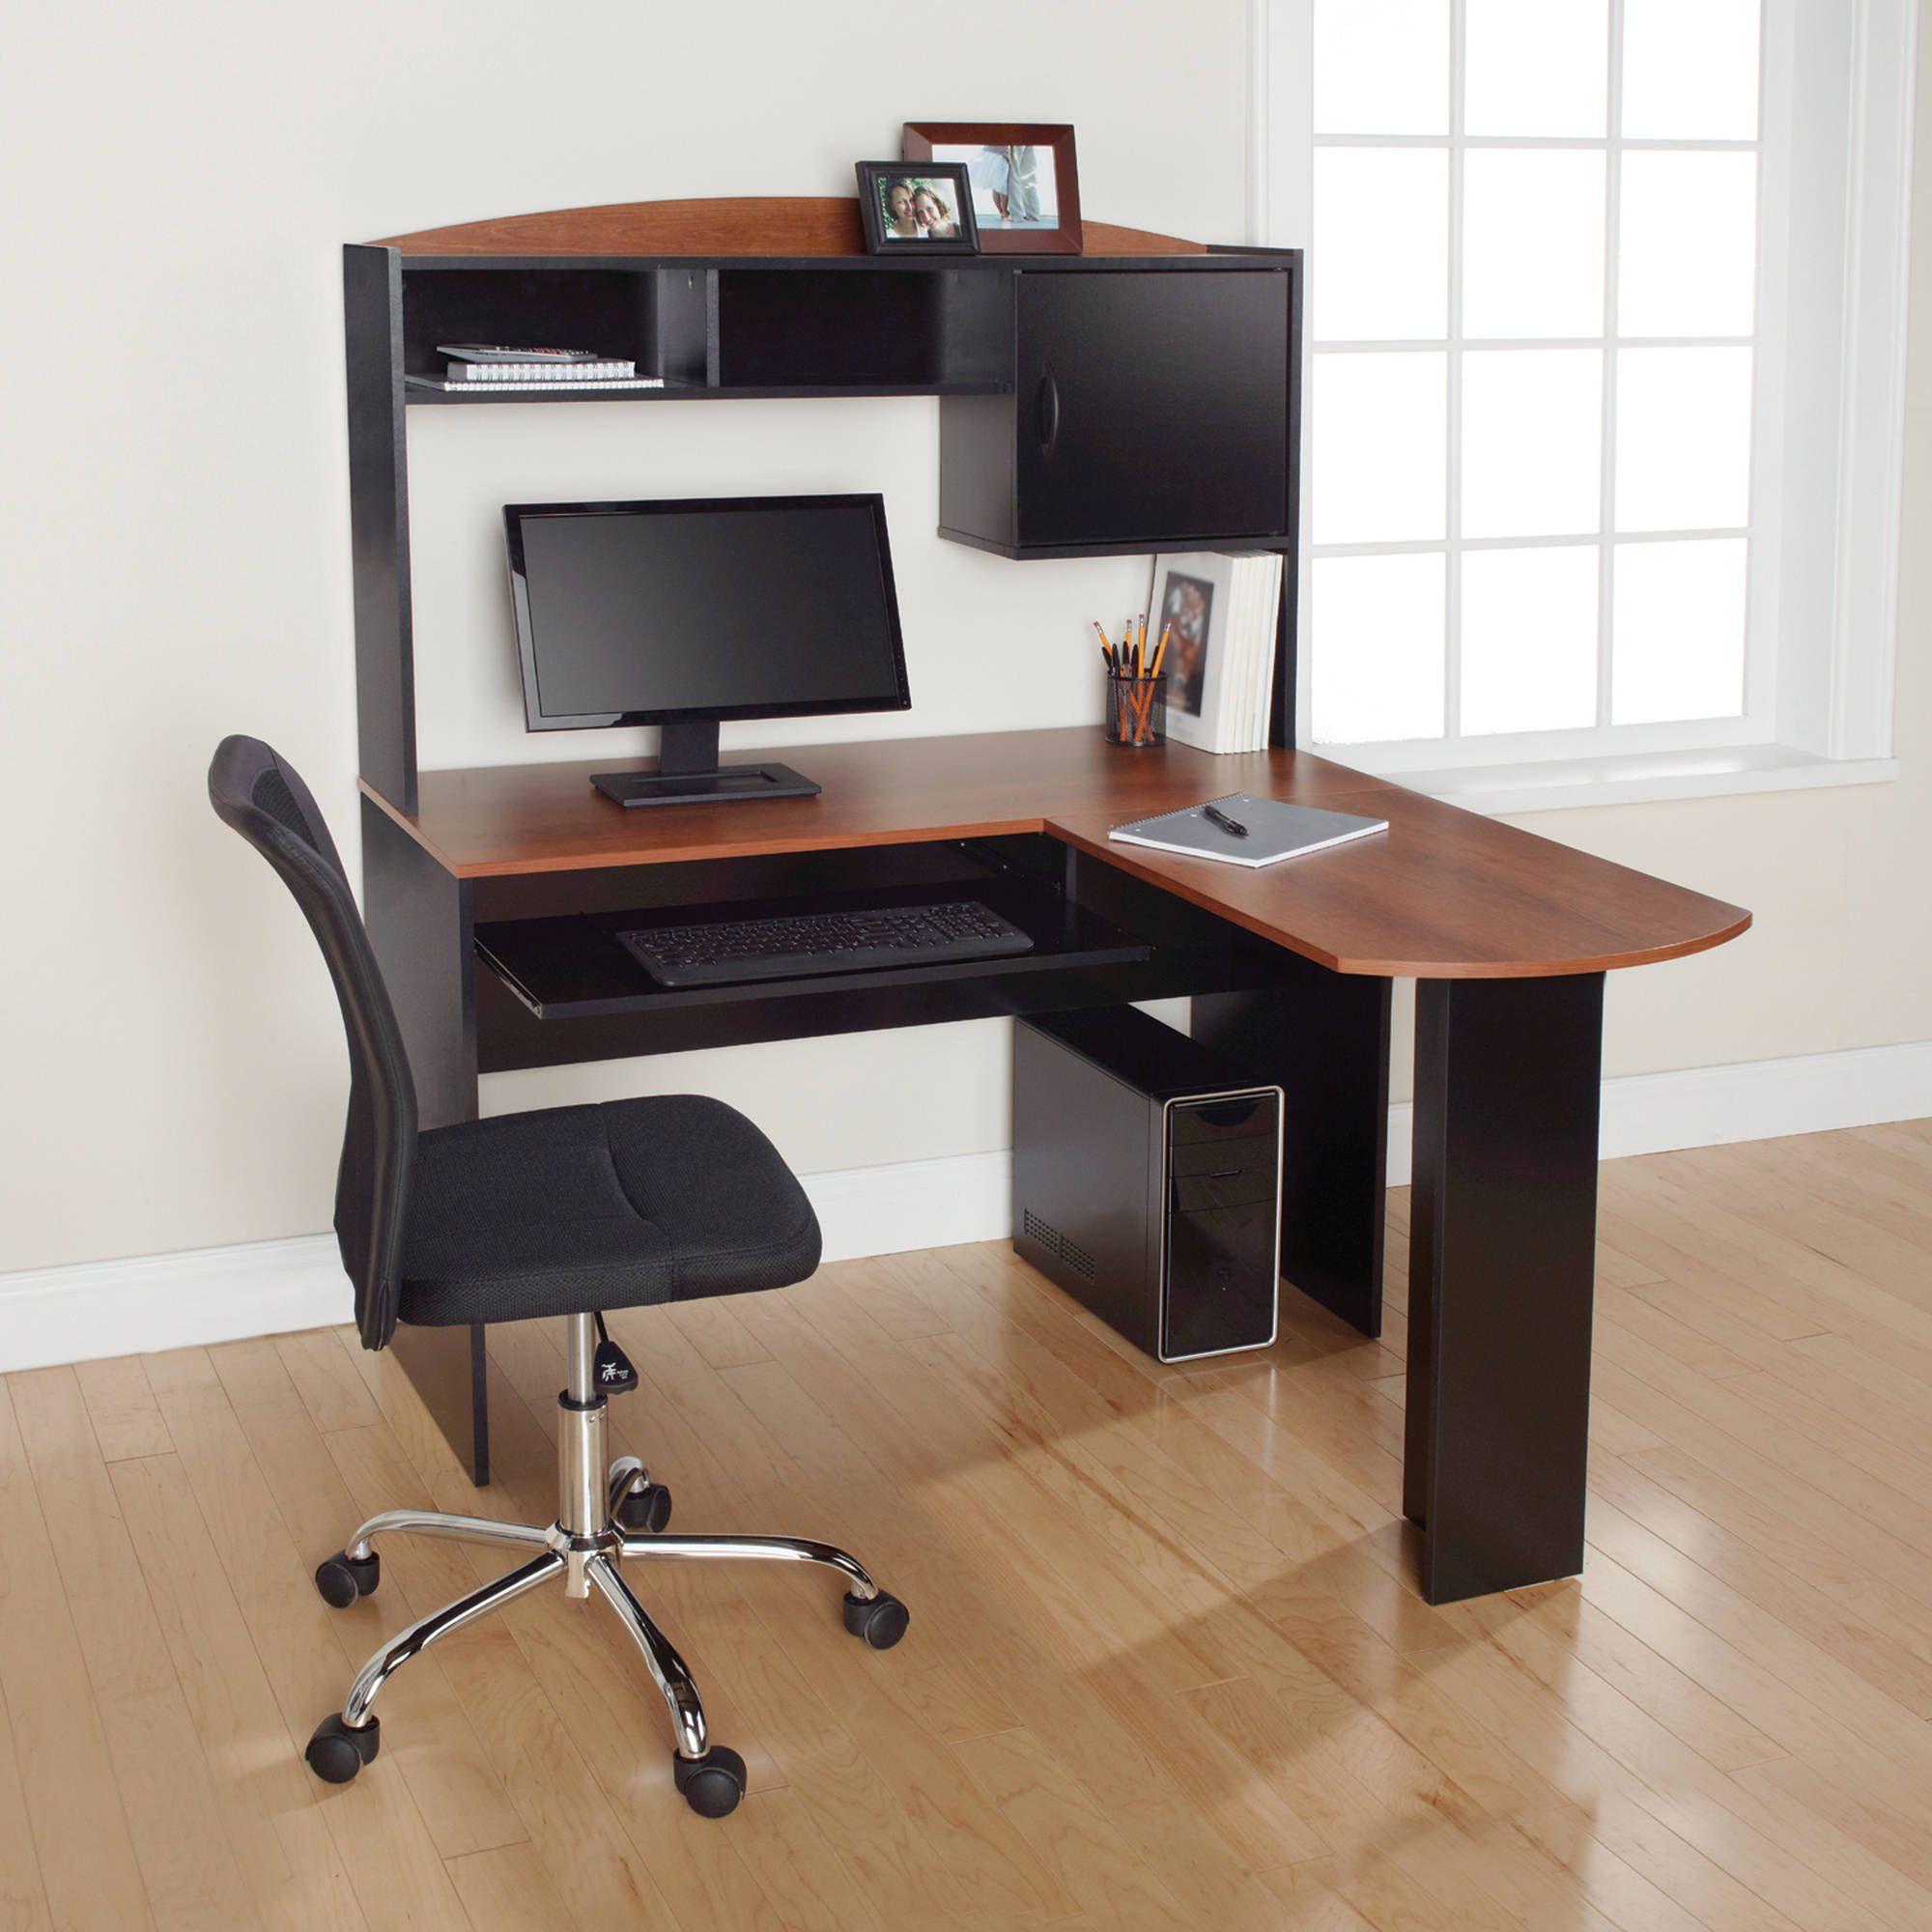 furniture rum office black thedigitalhandshake corner simple home desk cubby with